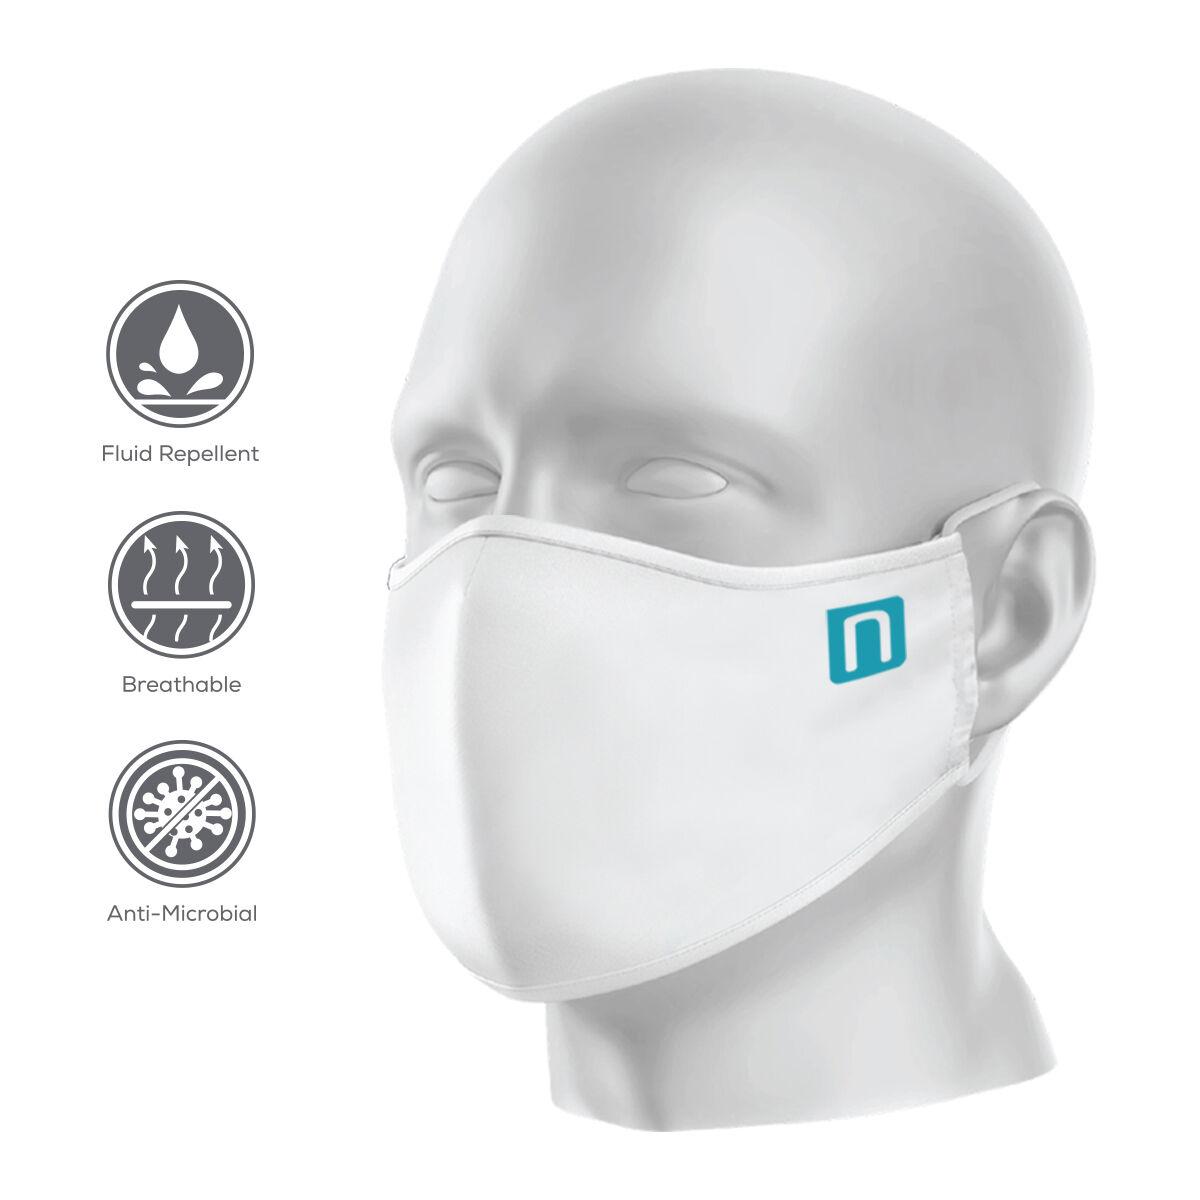 Fluid Repellent Face Mask